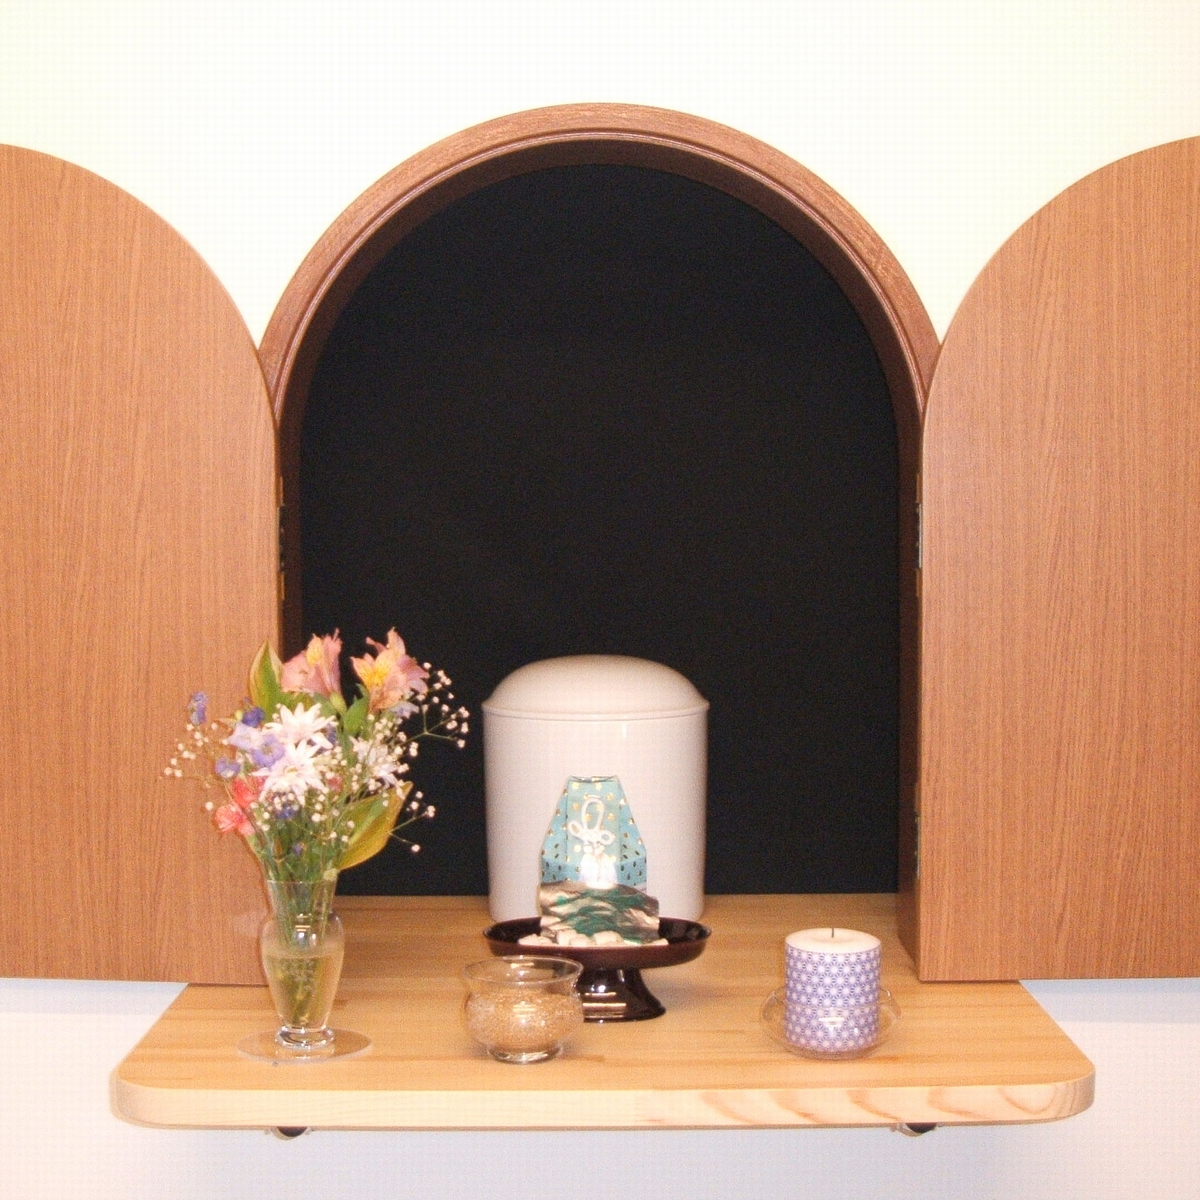 共同納骨棚前の専用祭壇